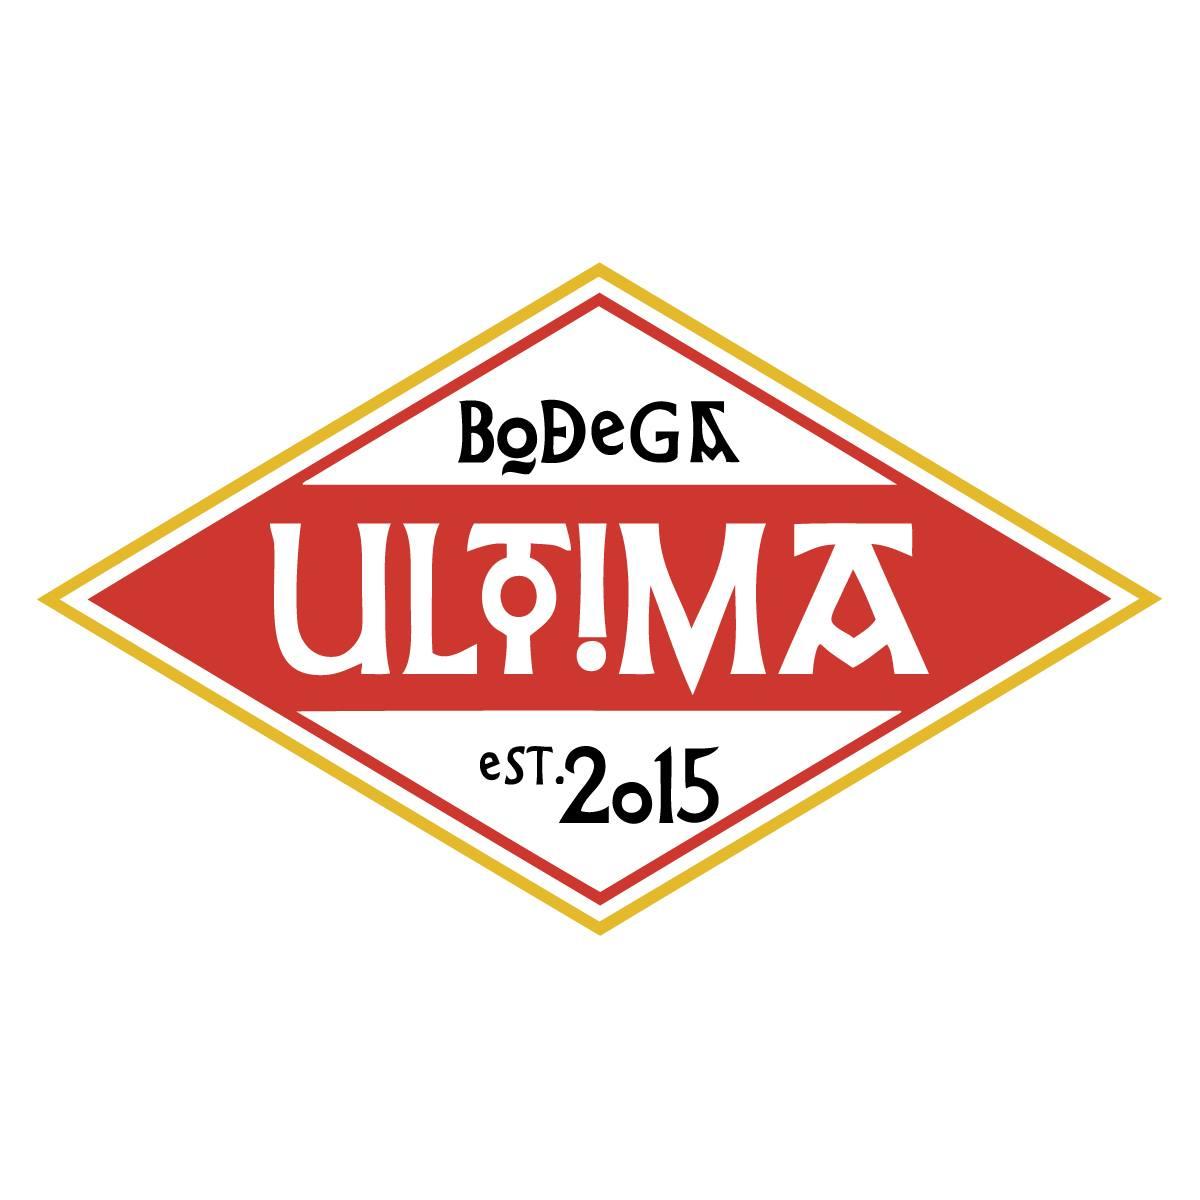 Bodega Ultima